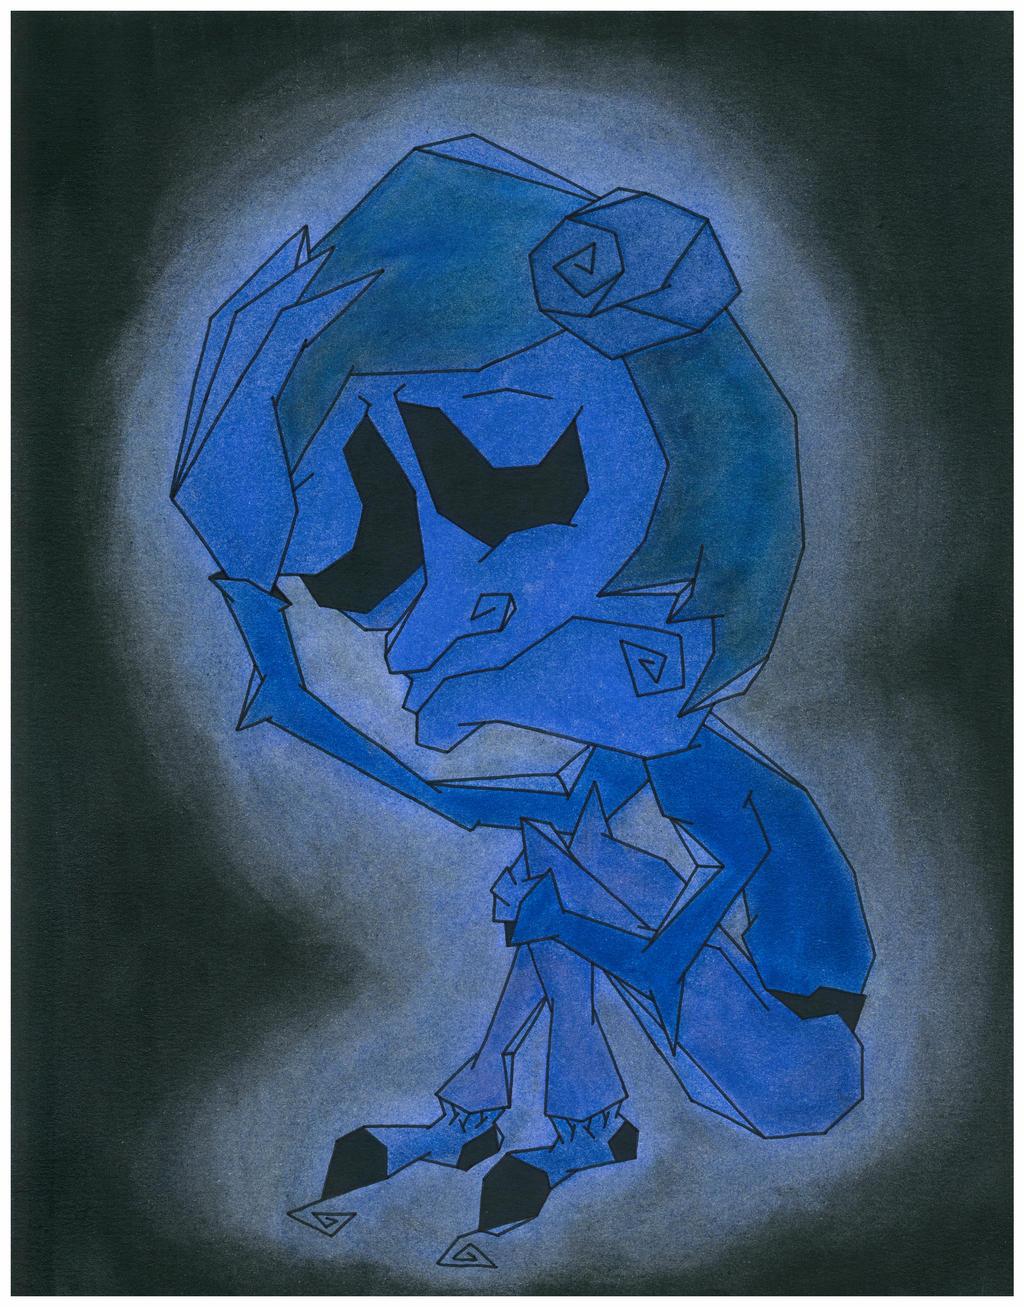 Despair by Morebud